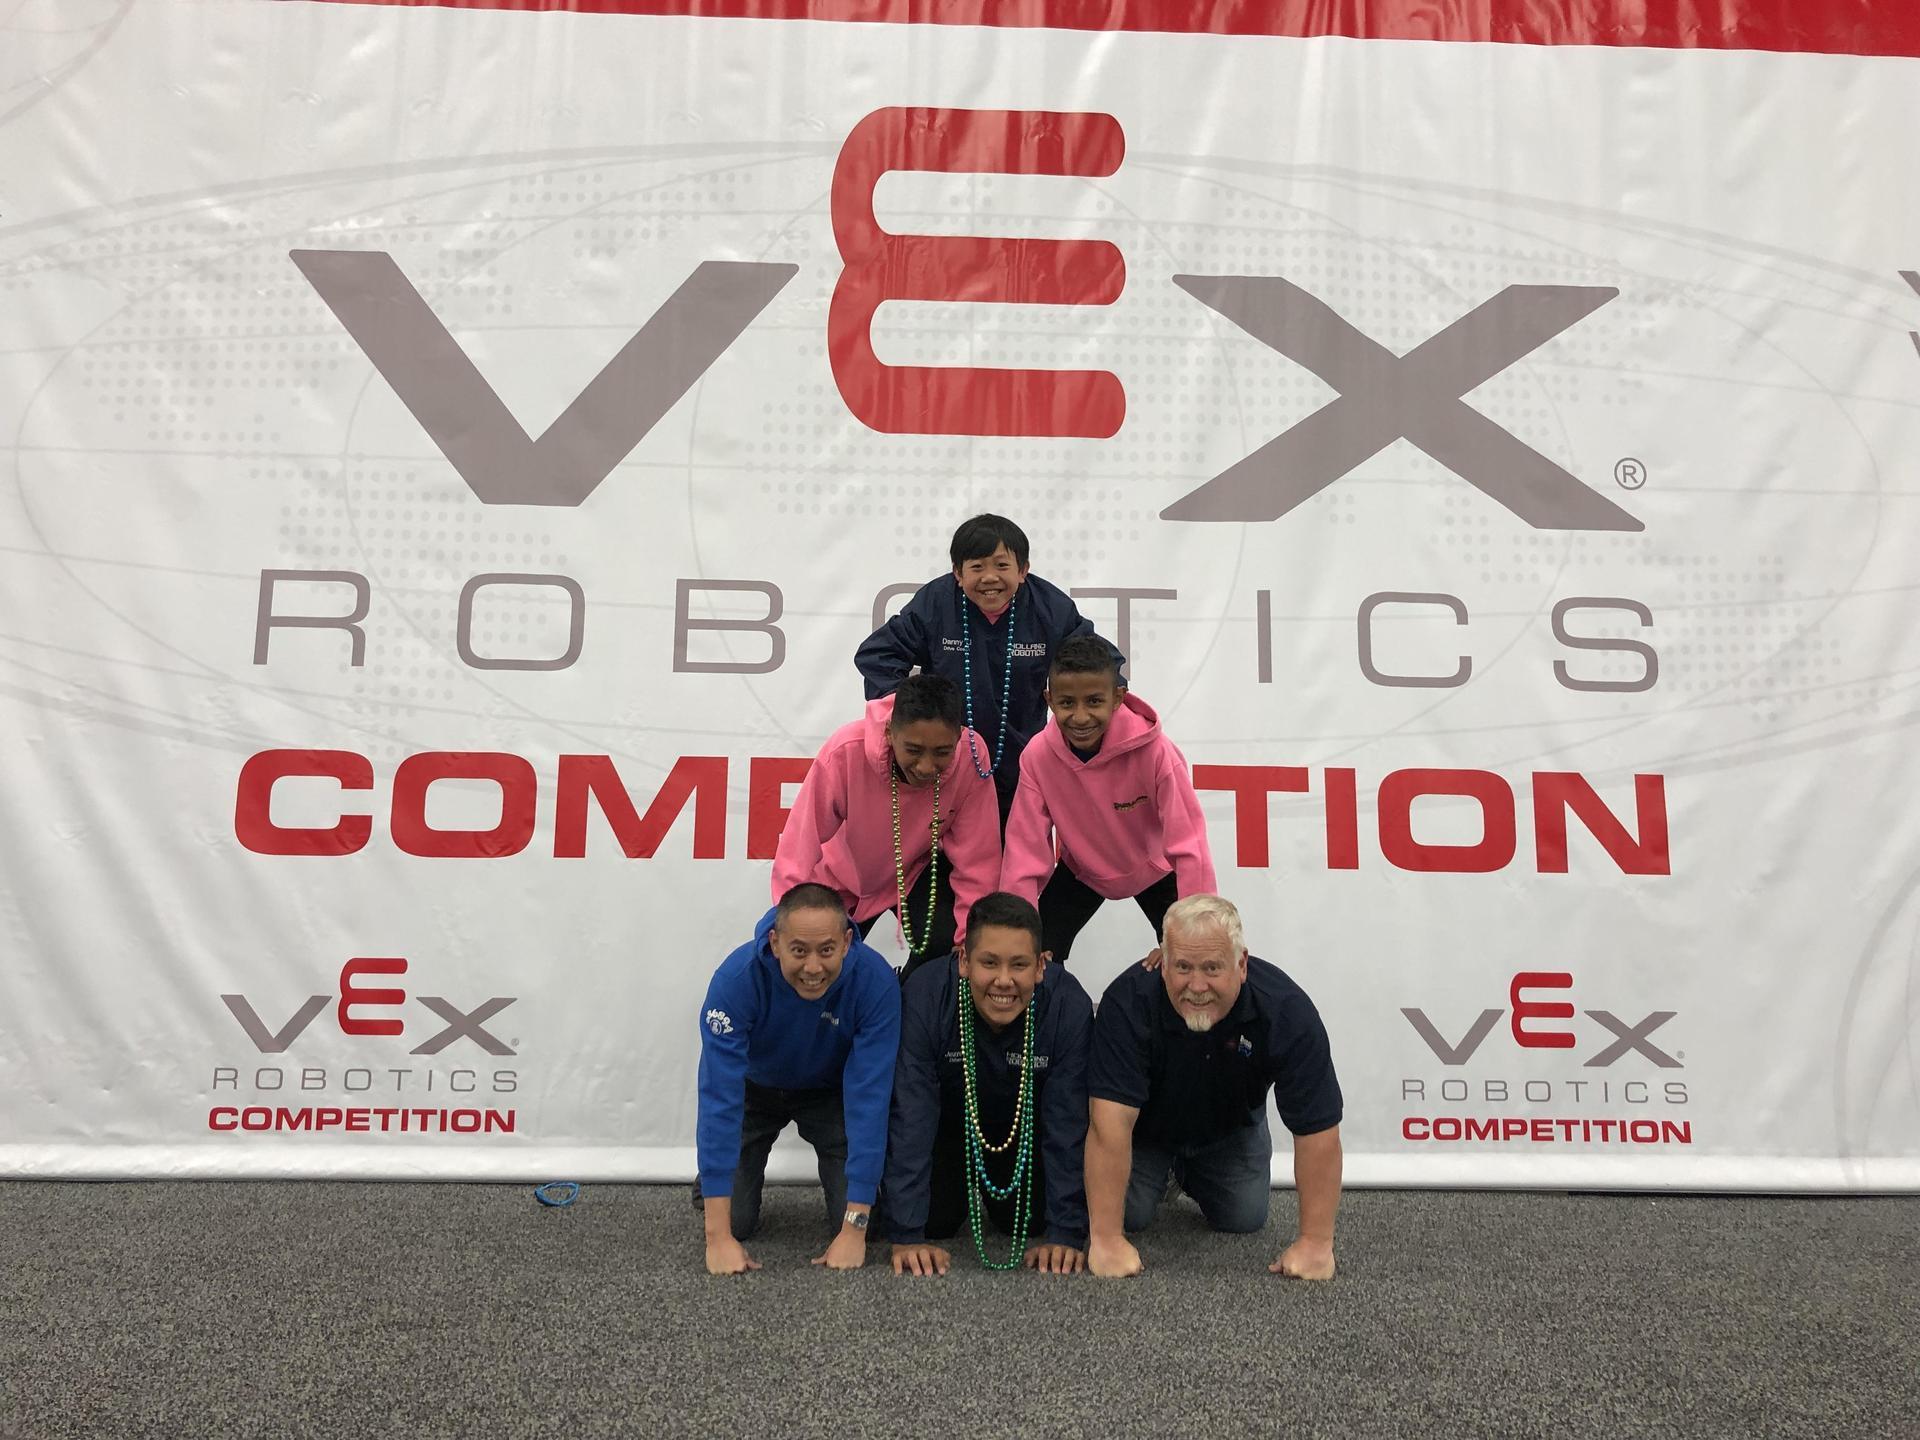 VEX World image 7